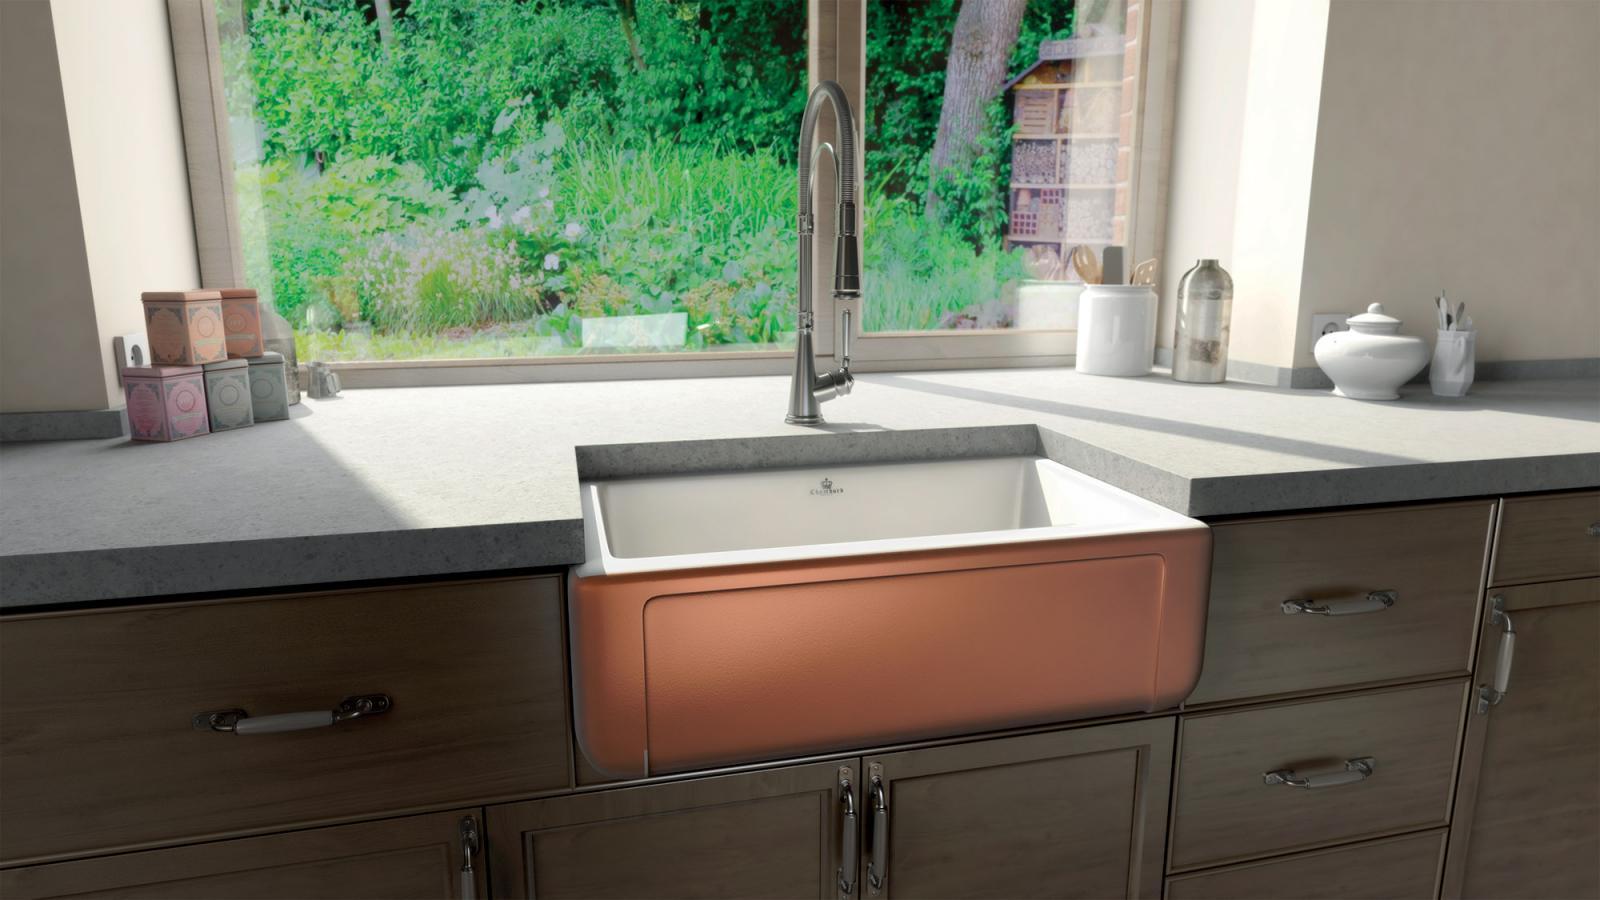 High-quality sink Henri II Le Grand Copper - single bowl, ceramic